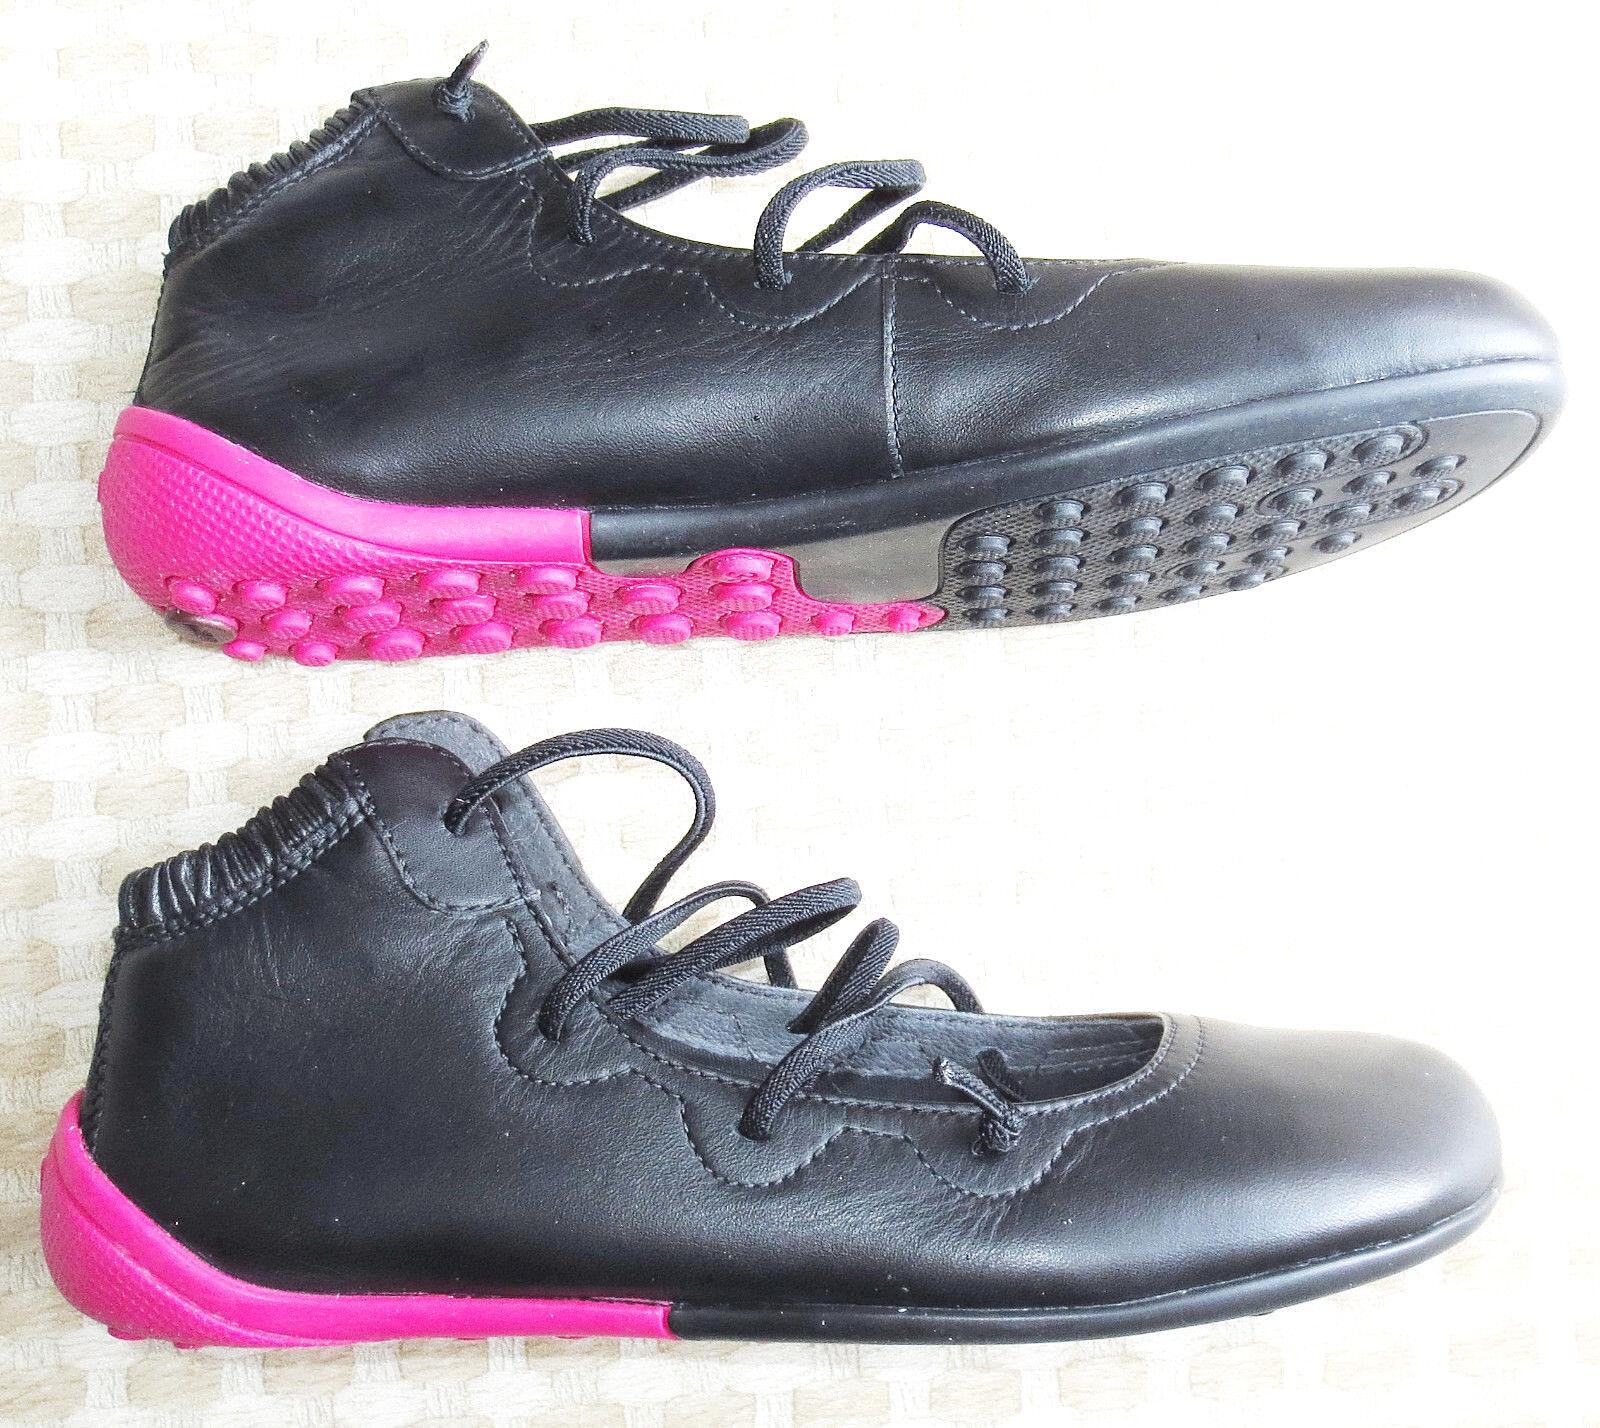 CAMPER Right Nina BLACK LEATHER Ballet FLATS Mary Jane Slip On shoes, Women Sz 6